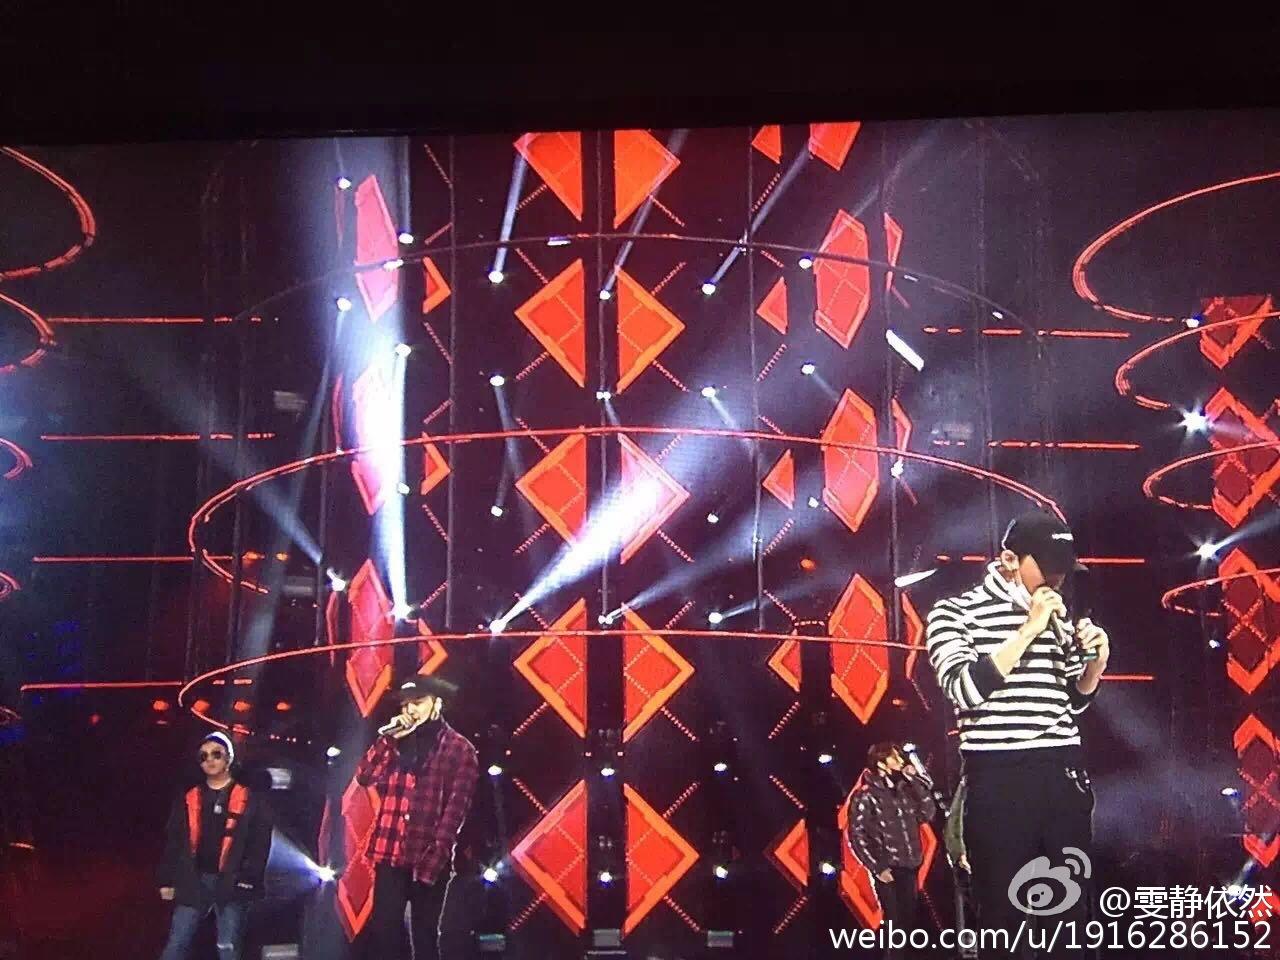 BIGBANG Rehearsals Hunan TV 31-12-2015 (3)